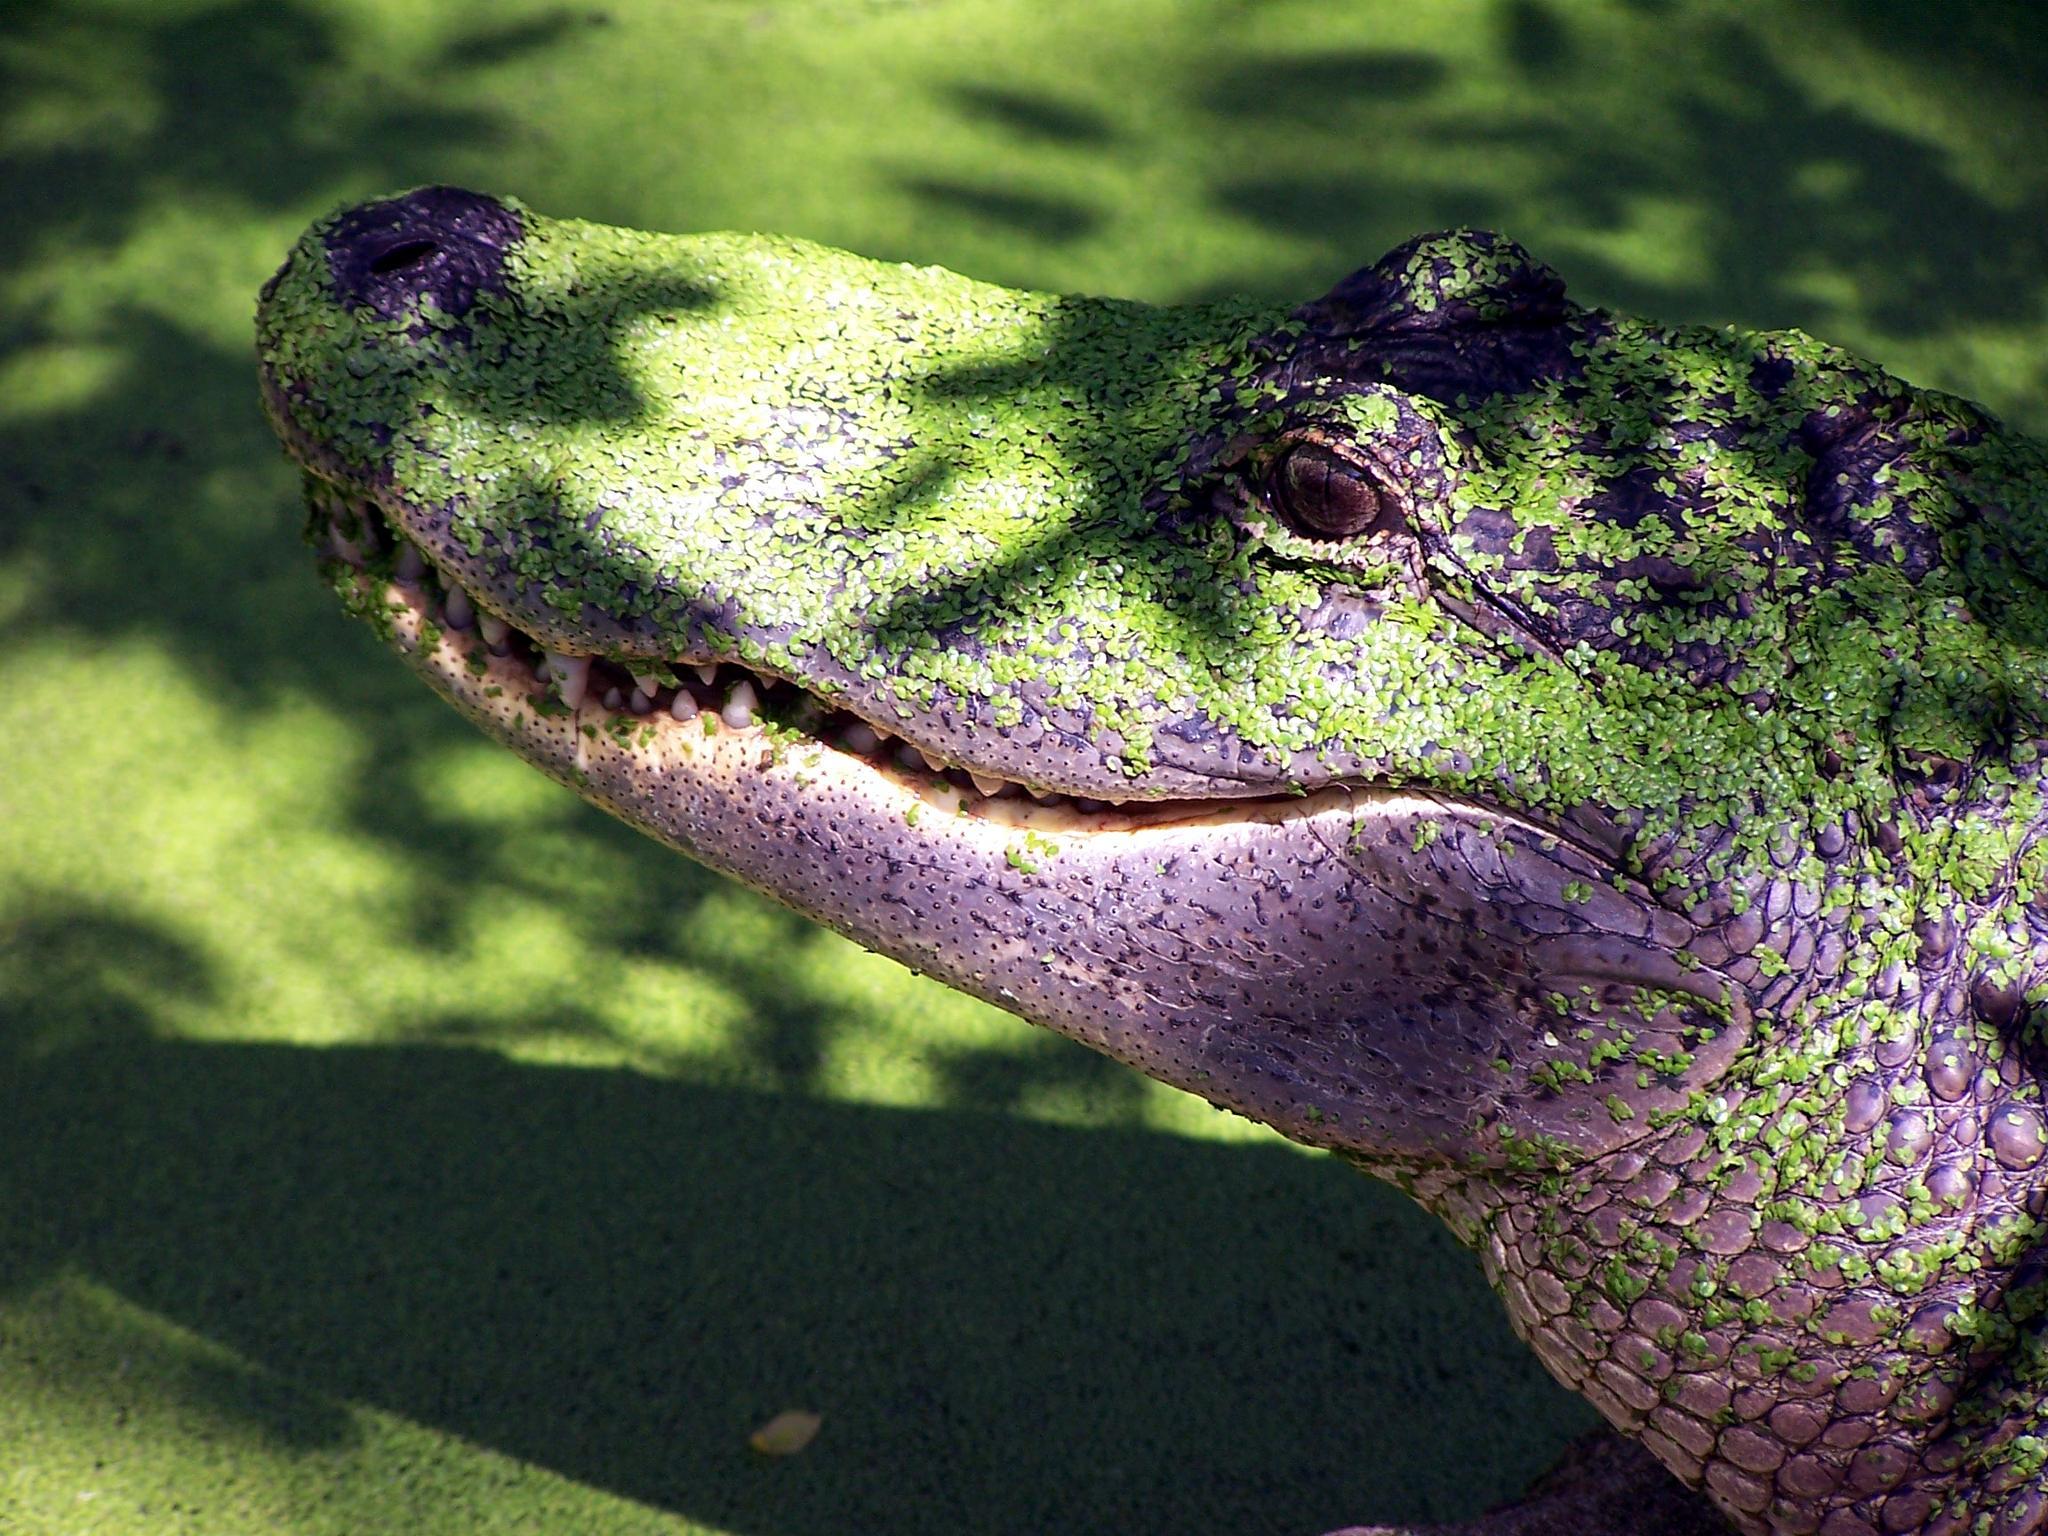 Alligator by Patrick Patterson